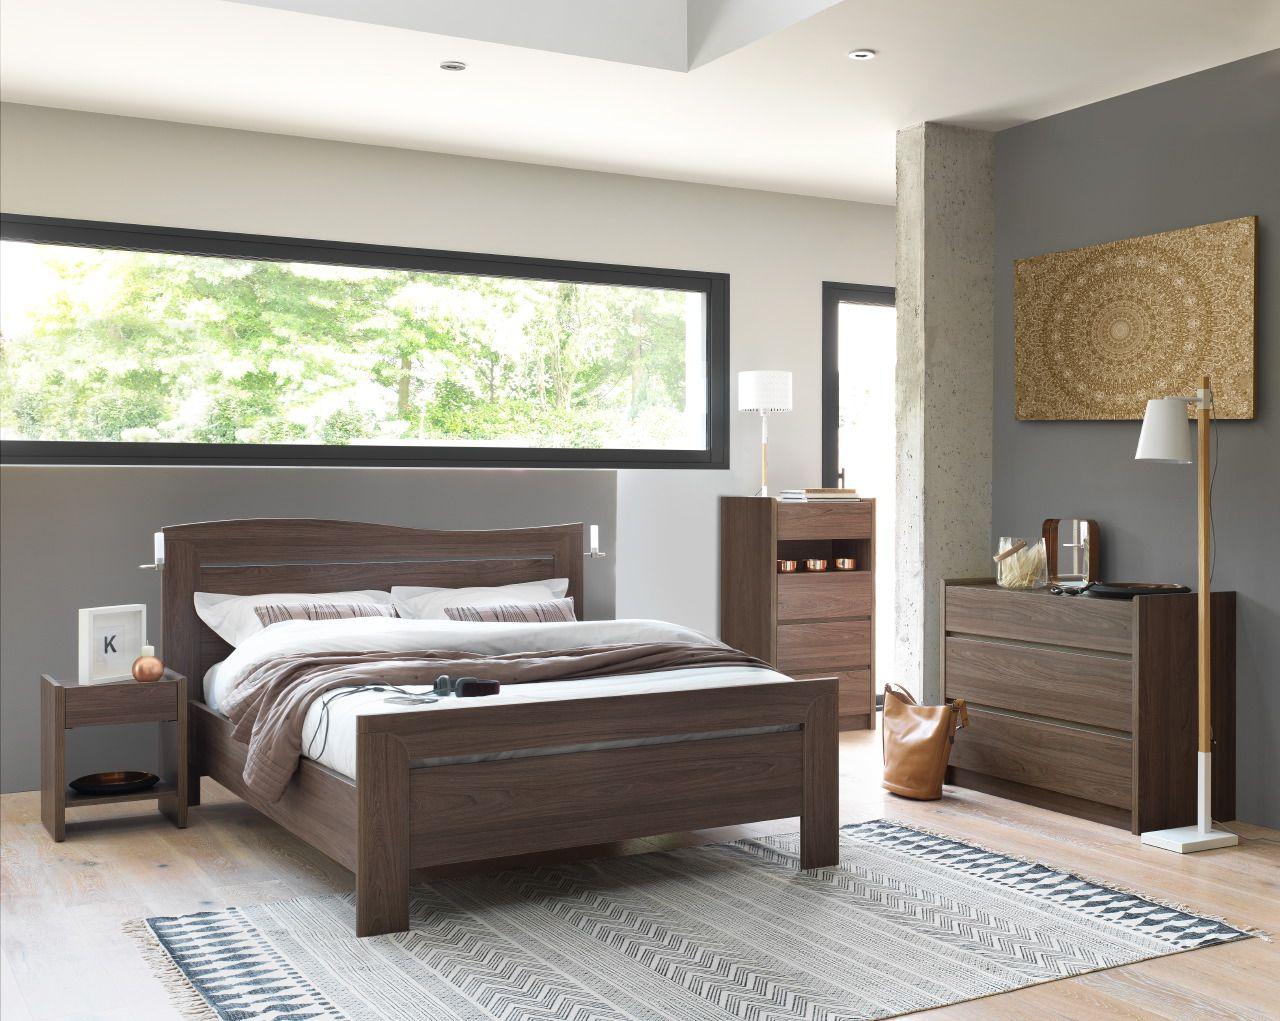 Bedroom Celio Furniture Cosy Bedroom Celio Furniture Cosy L Qtsi Co